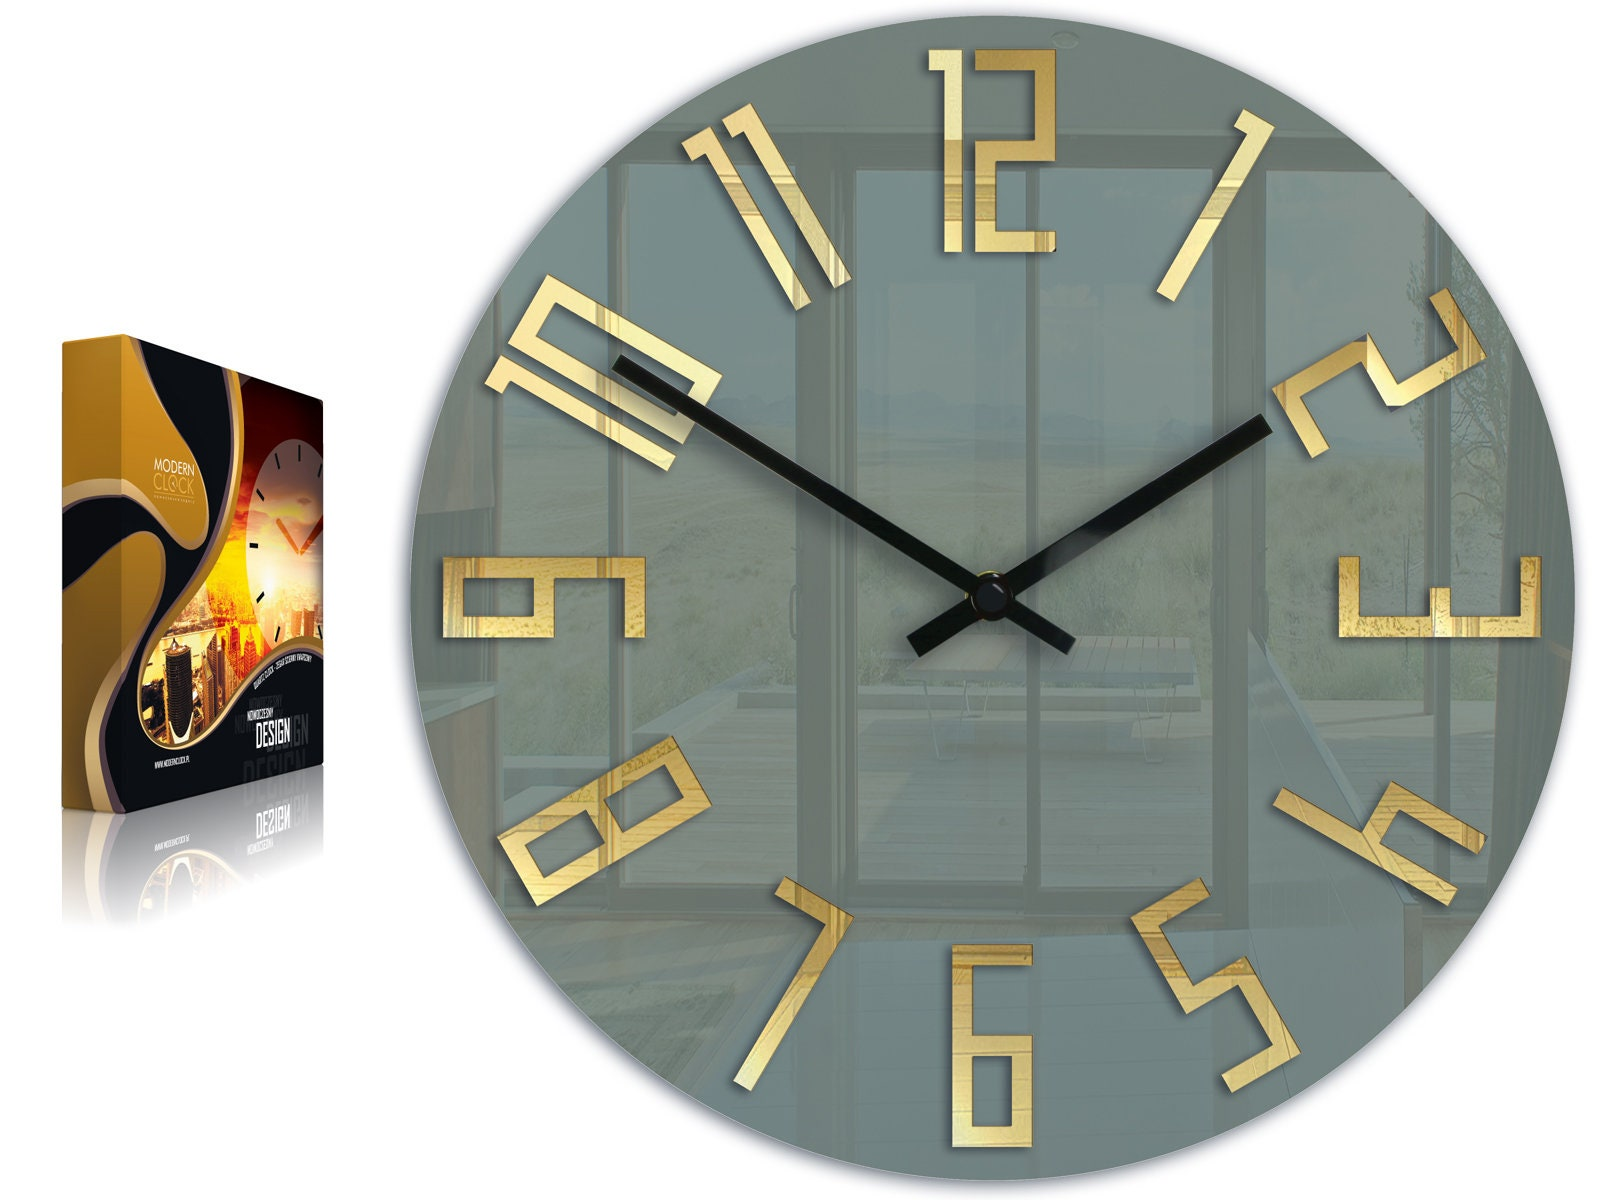 Large Wall Clock Mirror Gold Gray Clock Wall Clock Gift Wall Decor Modern Clock Modern Wall Clock Unique Wall Clocks Gift